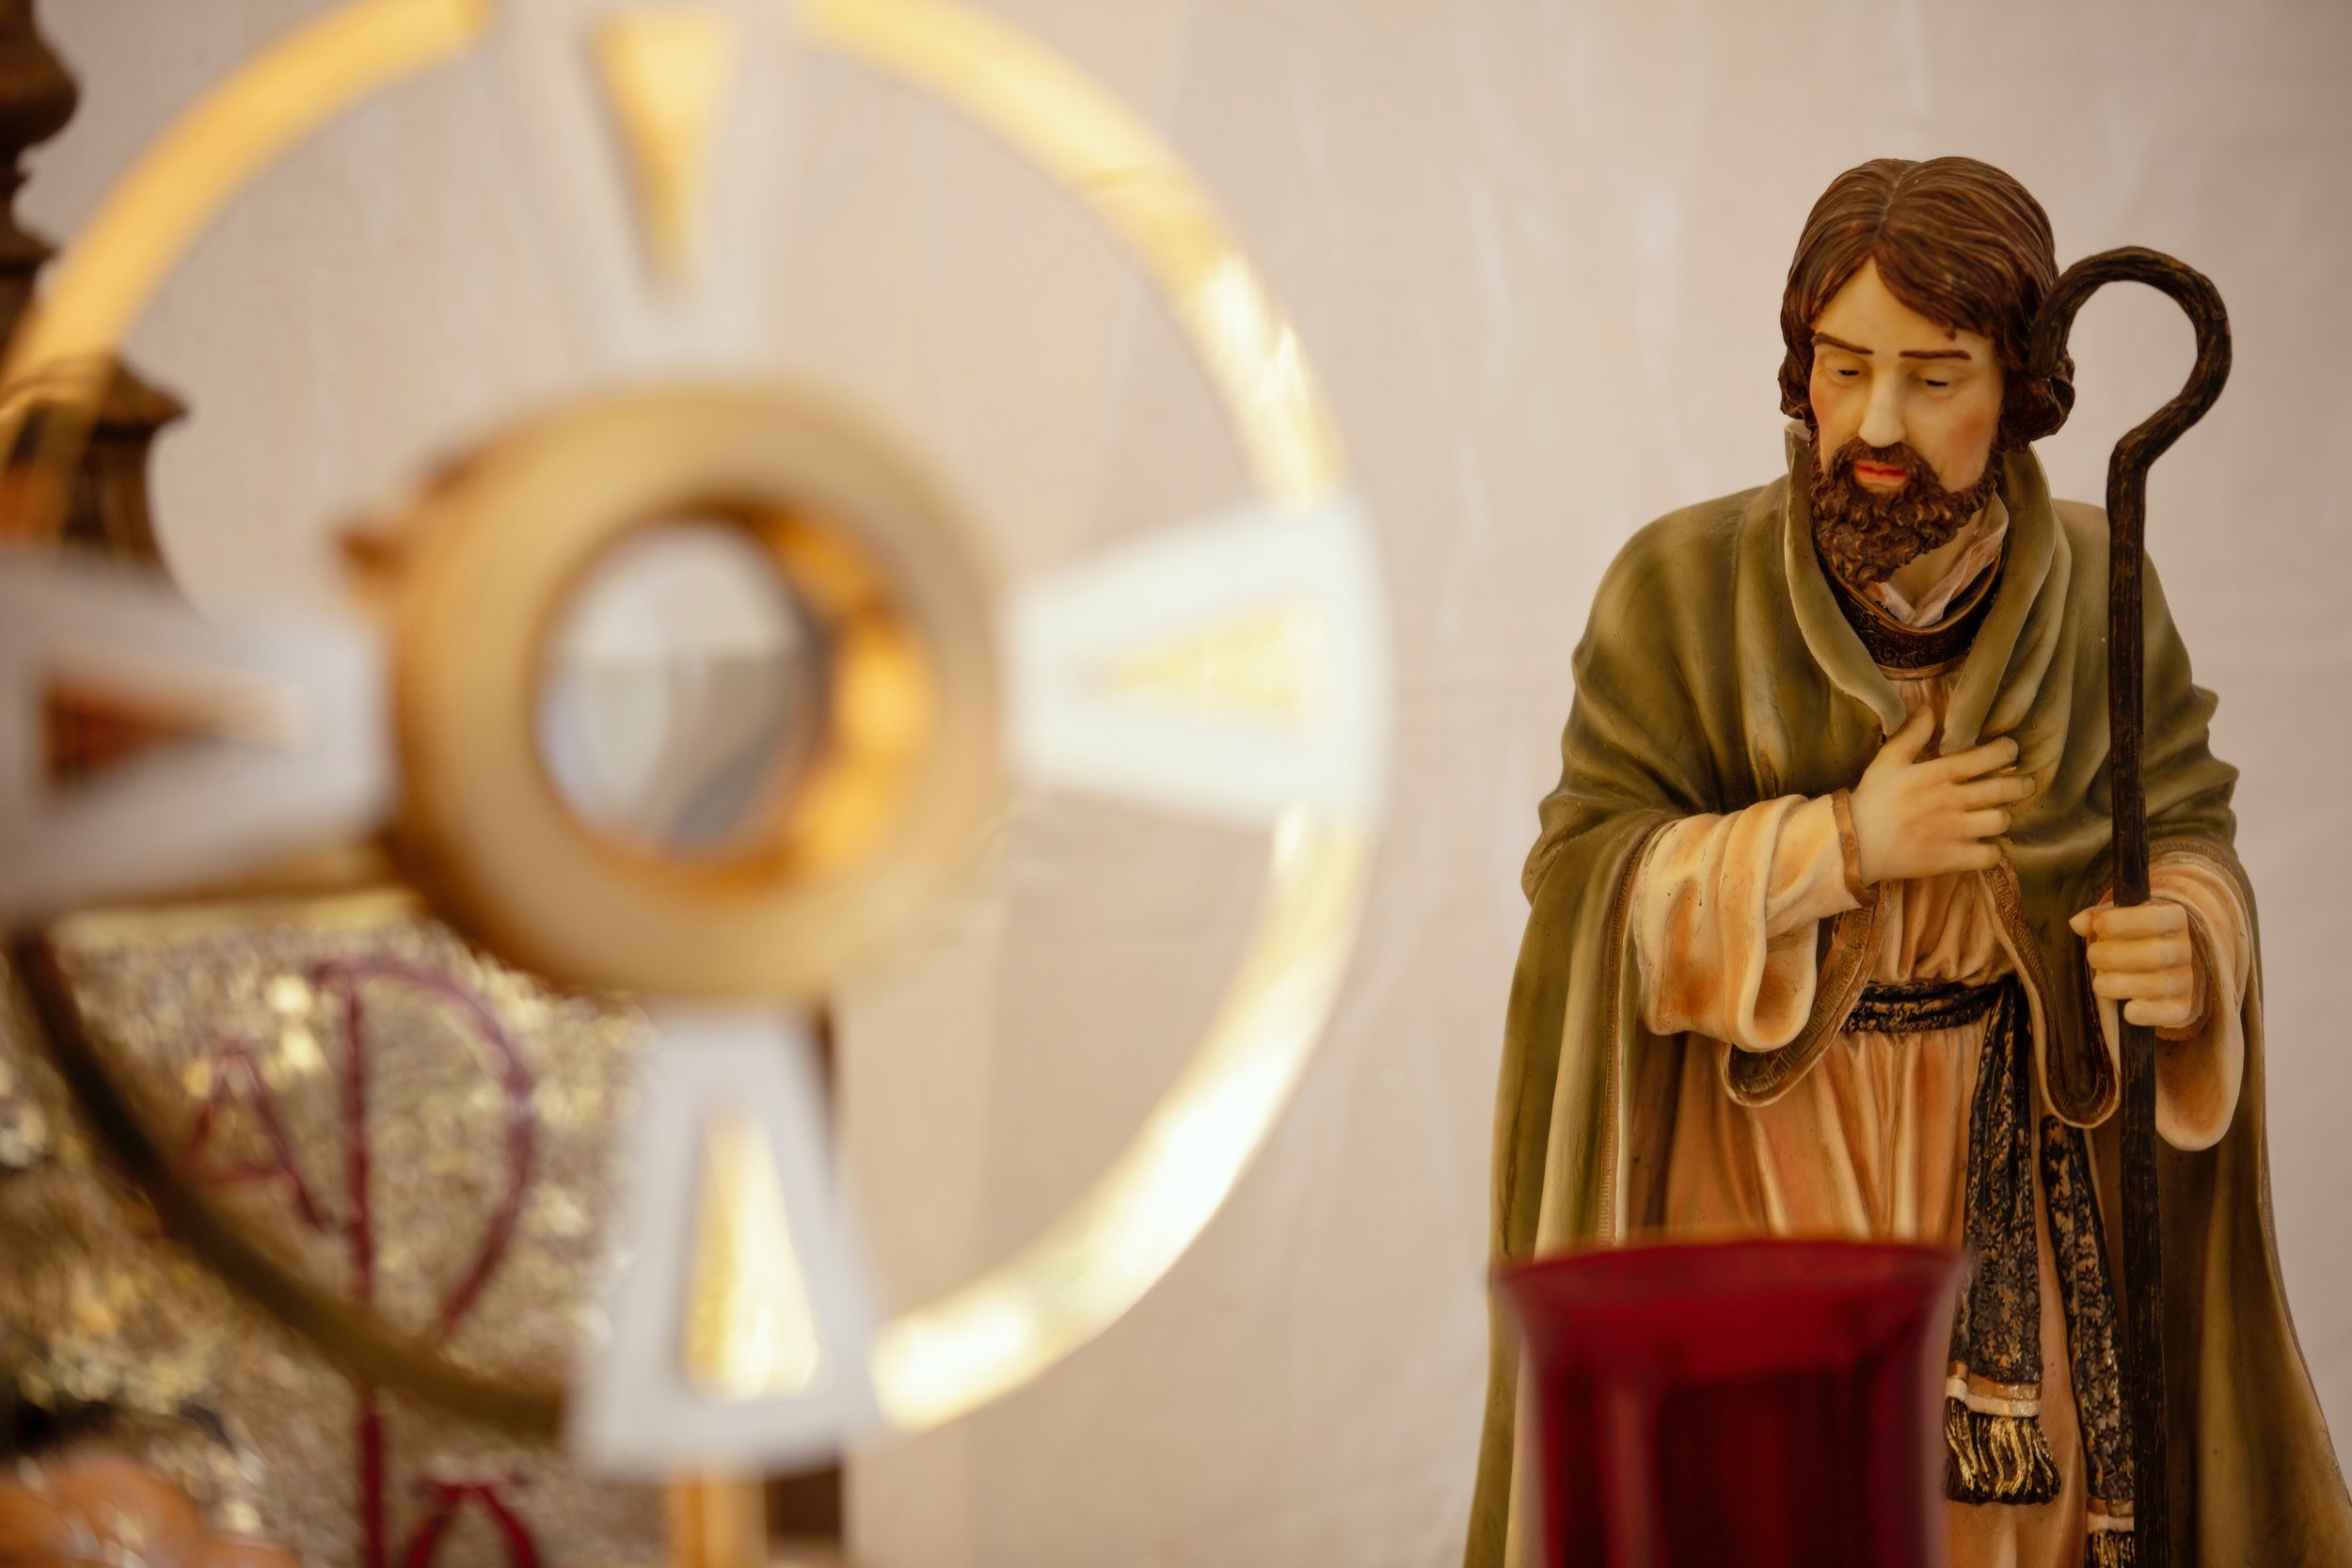 Saint Joseph and the Monstrance